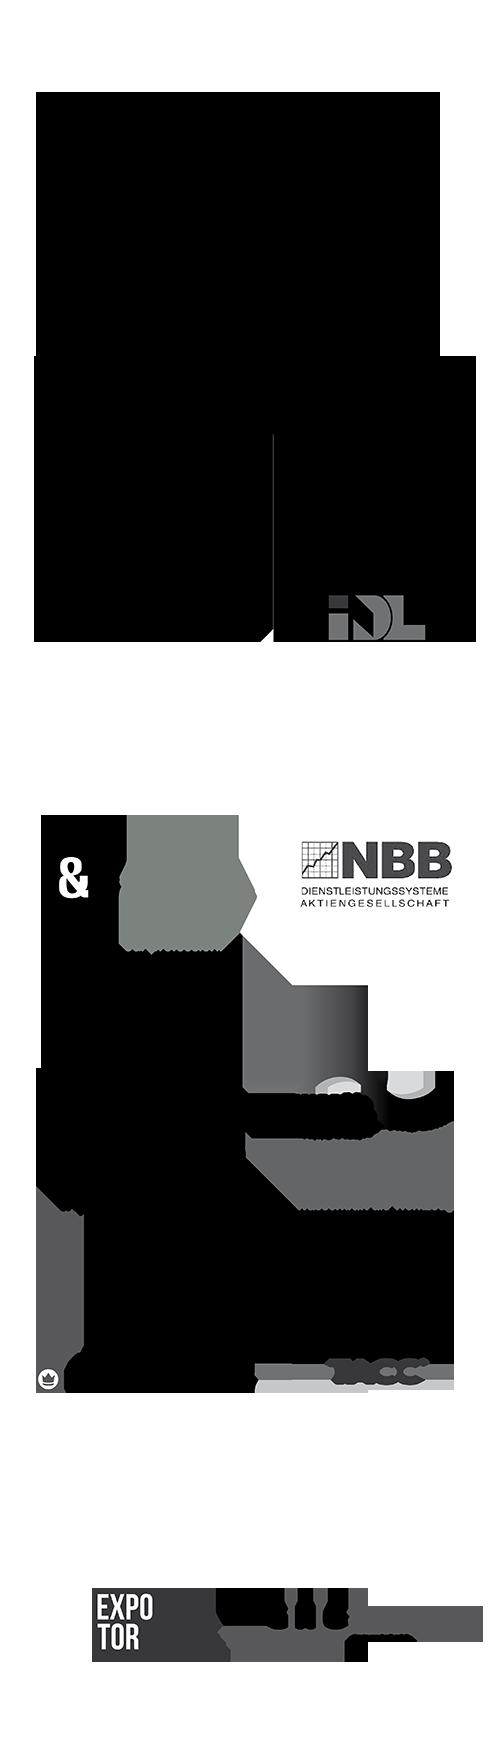 Referenzlen Logos